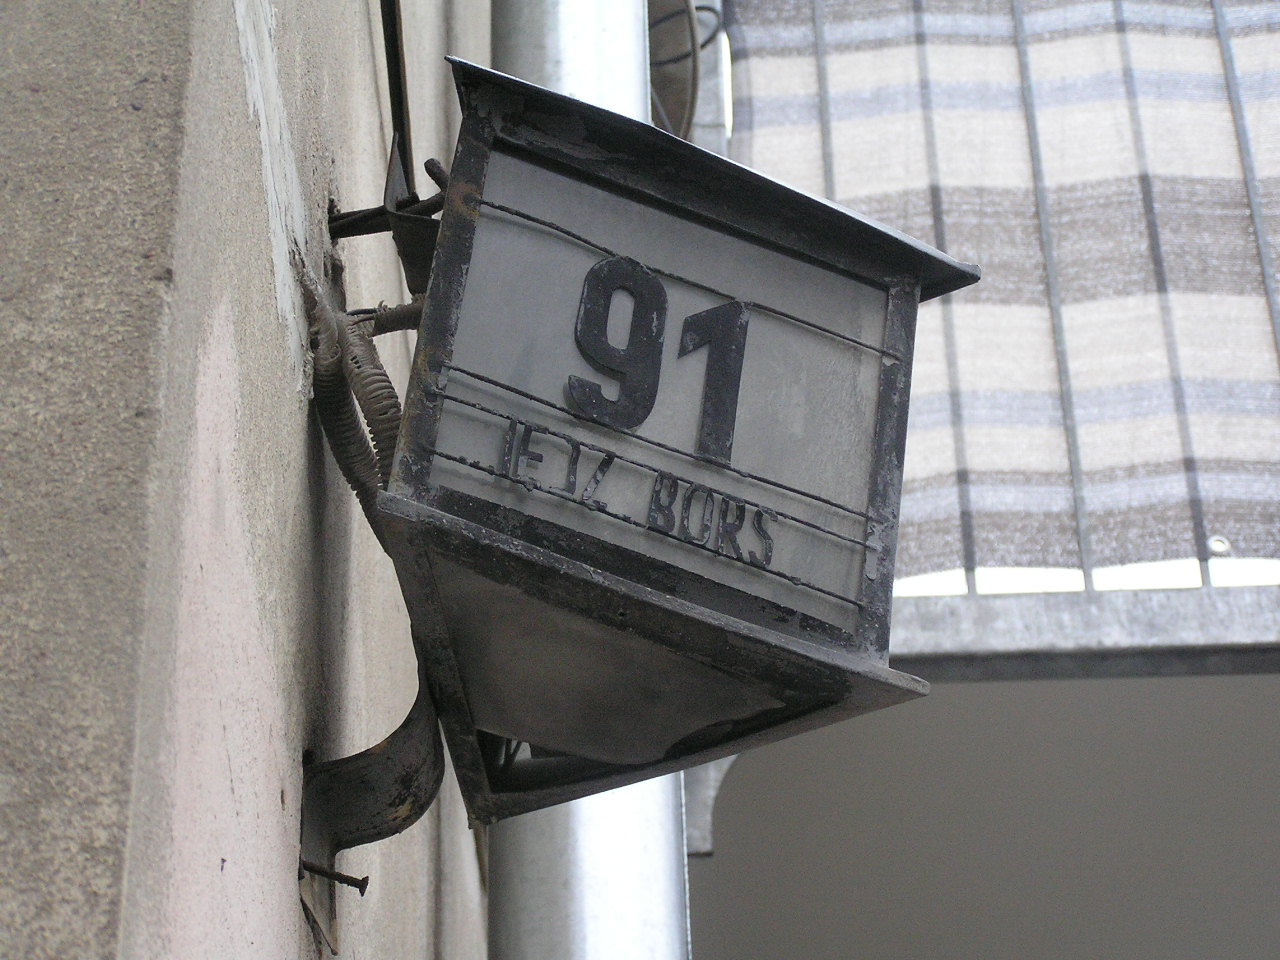 Latarenka adresowa - Międzyborska 91